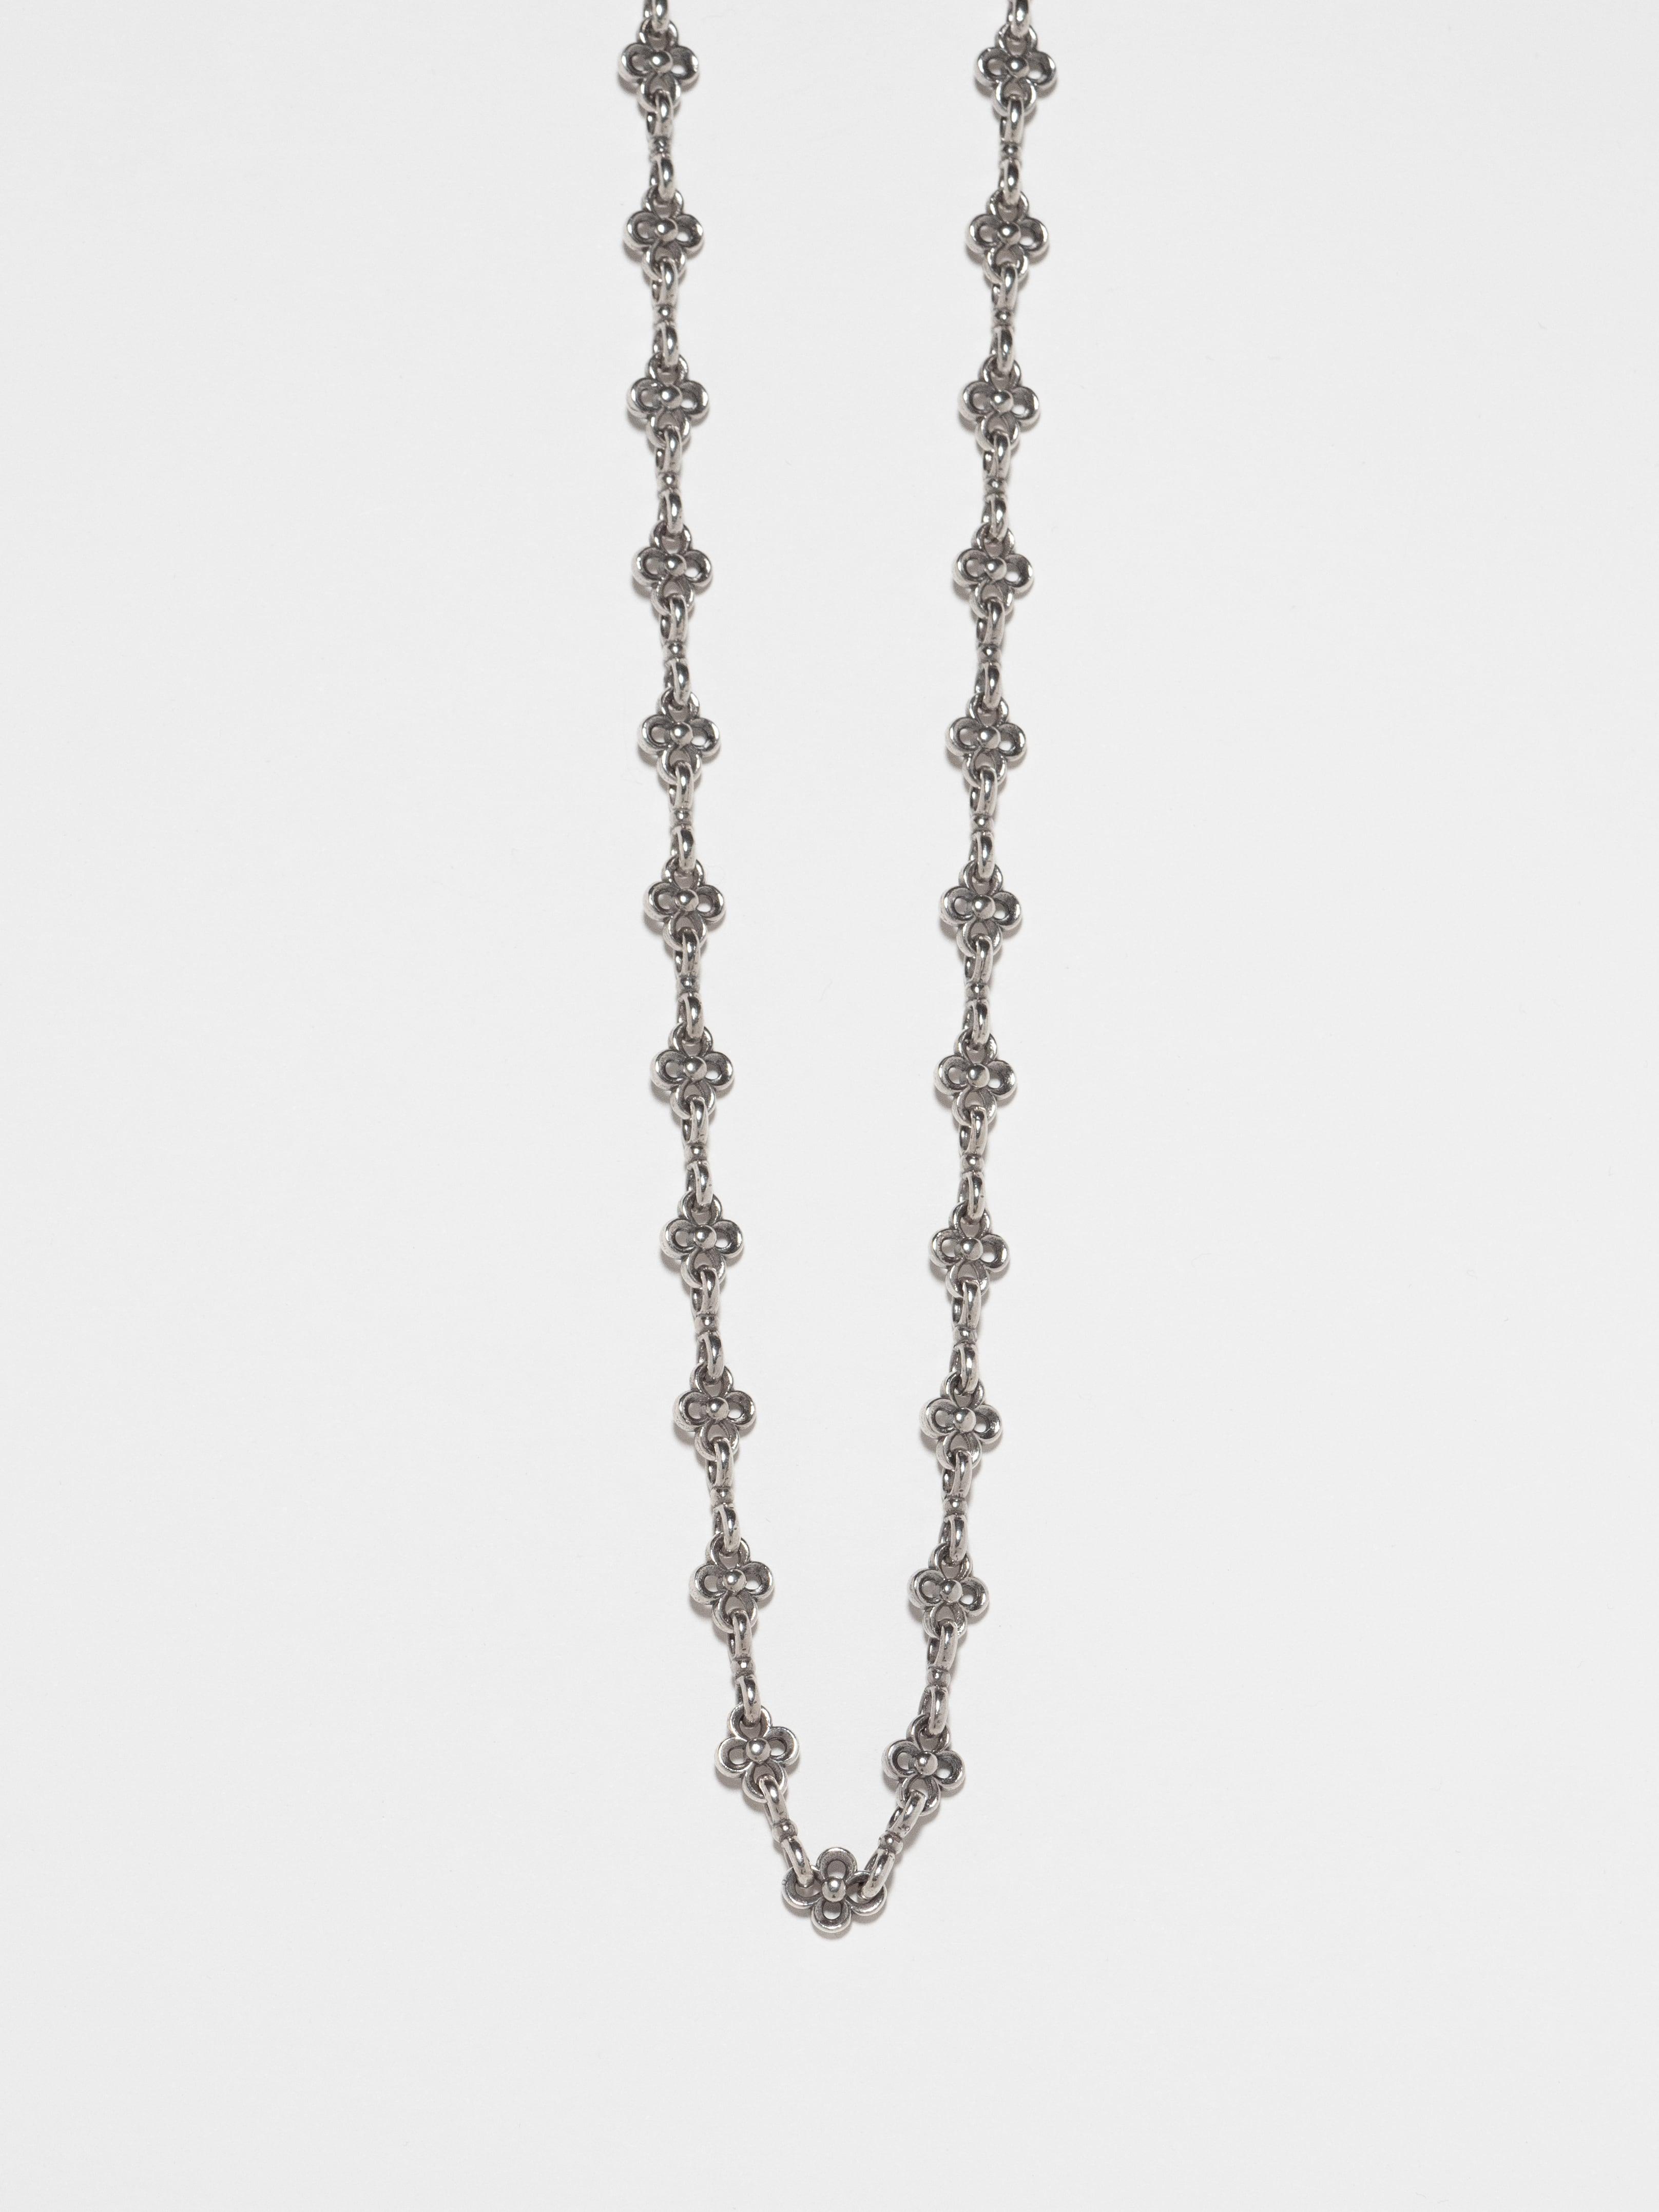 Handmade Chain Necklace 80cm / Gerochristo